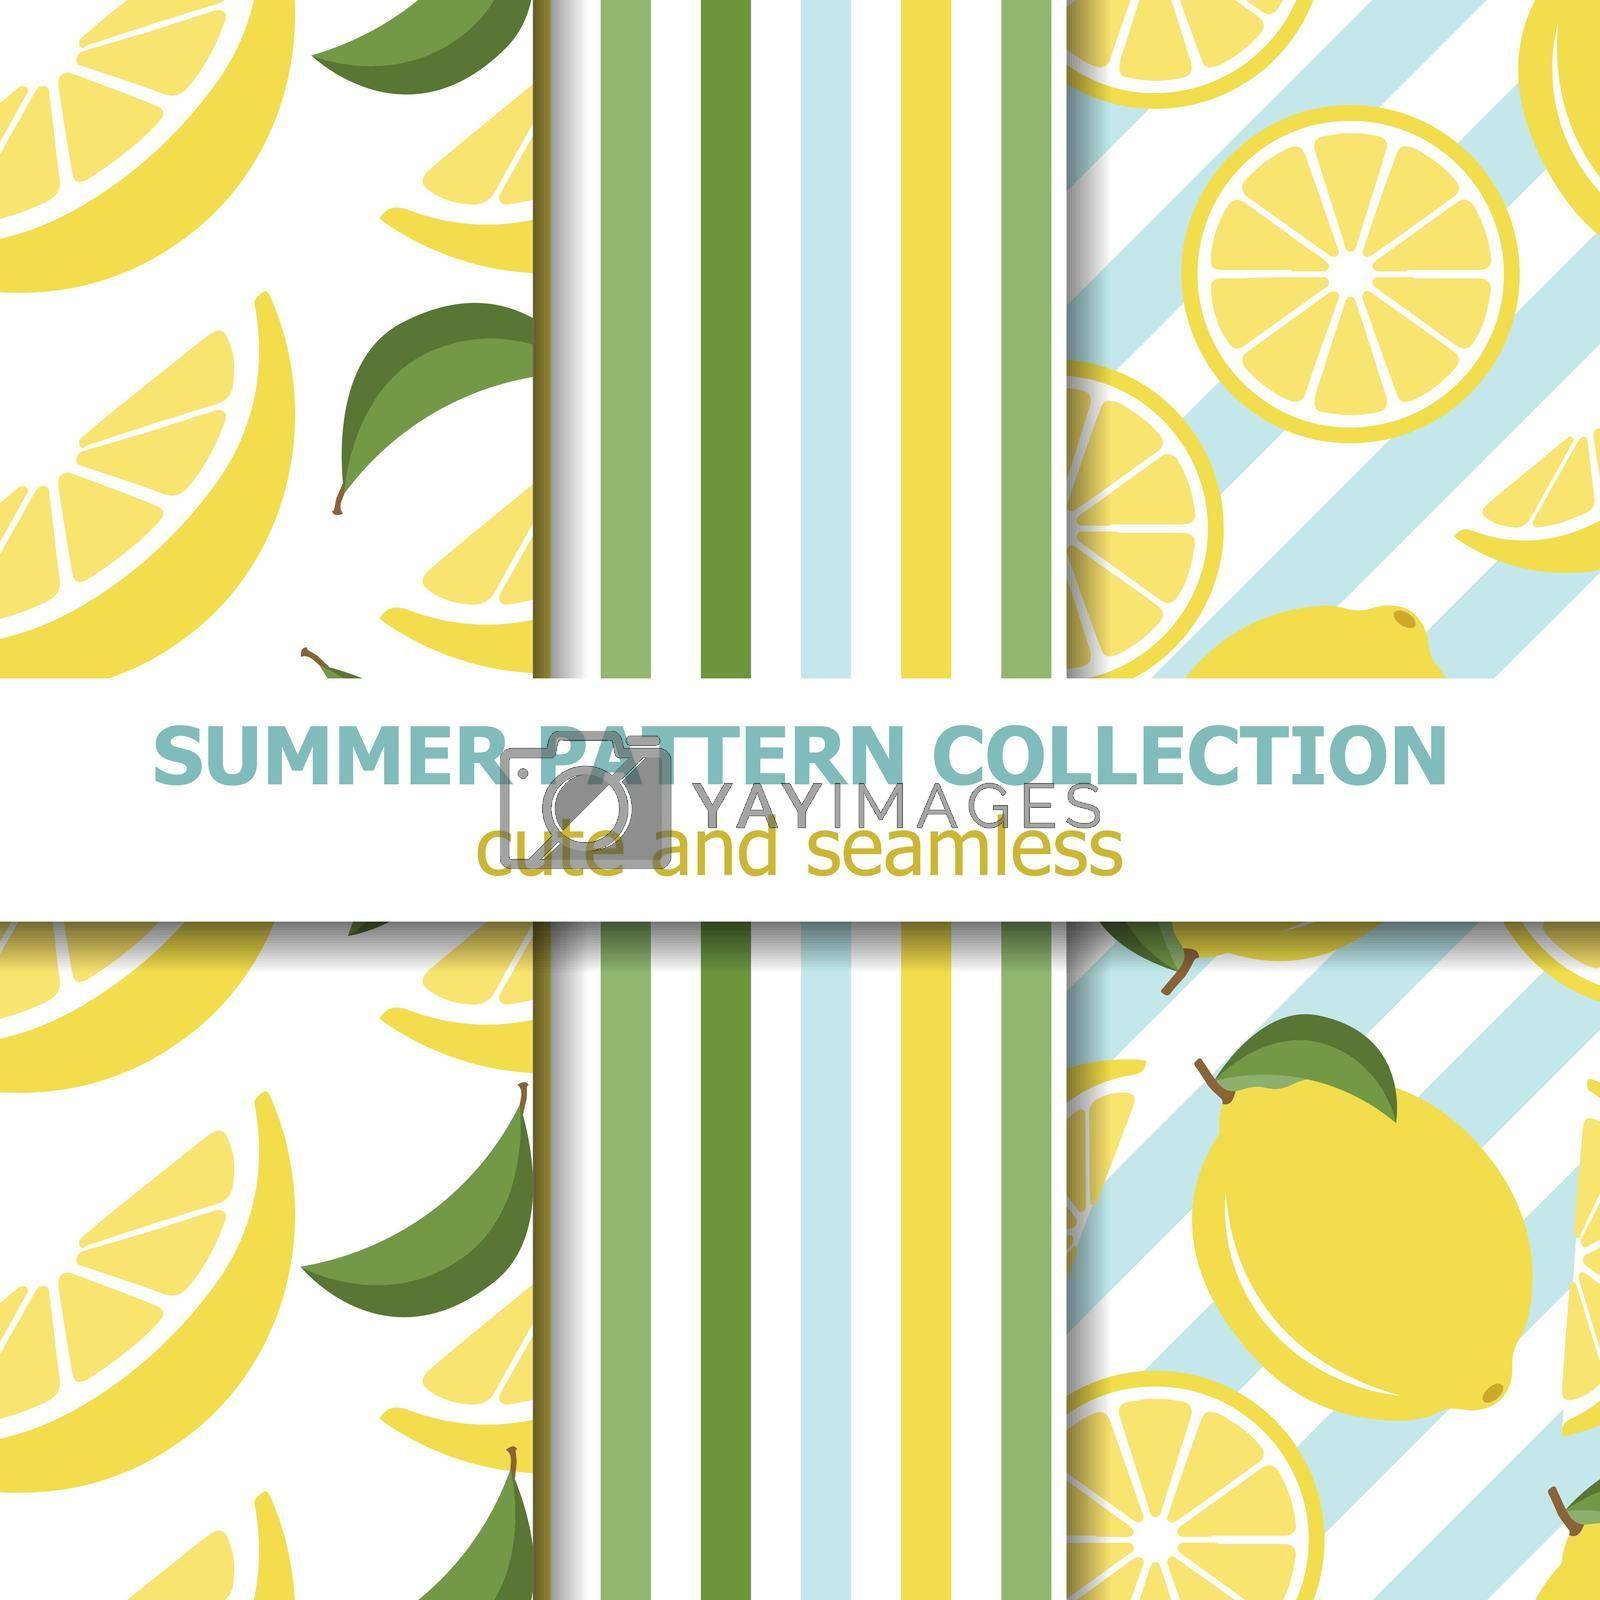 Juicy summer pattern collection. Lemon theme. Summer banner. Vector